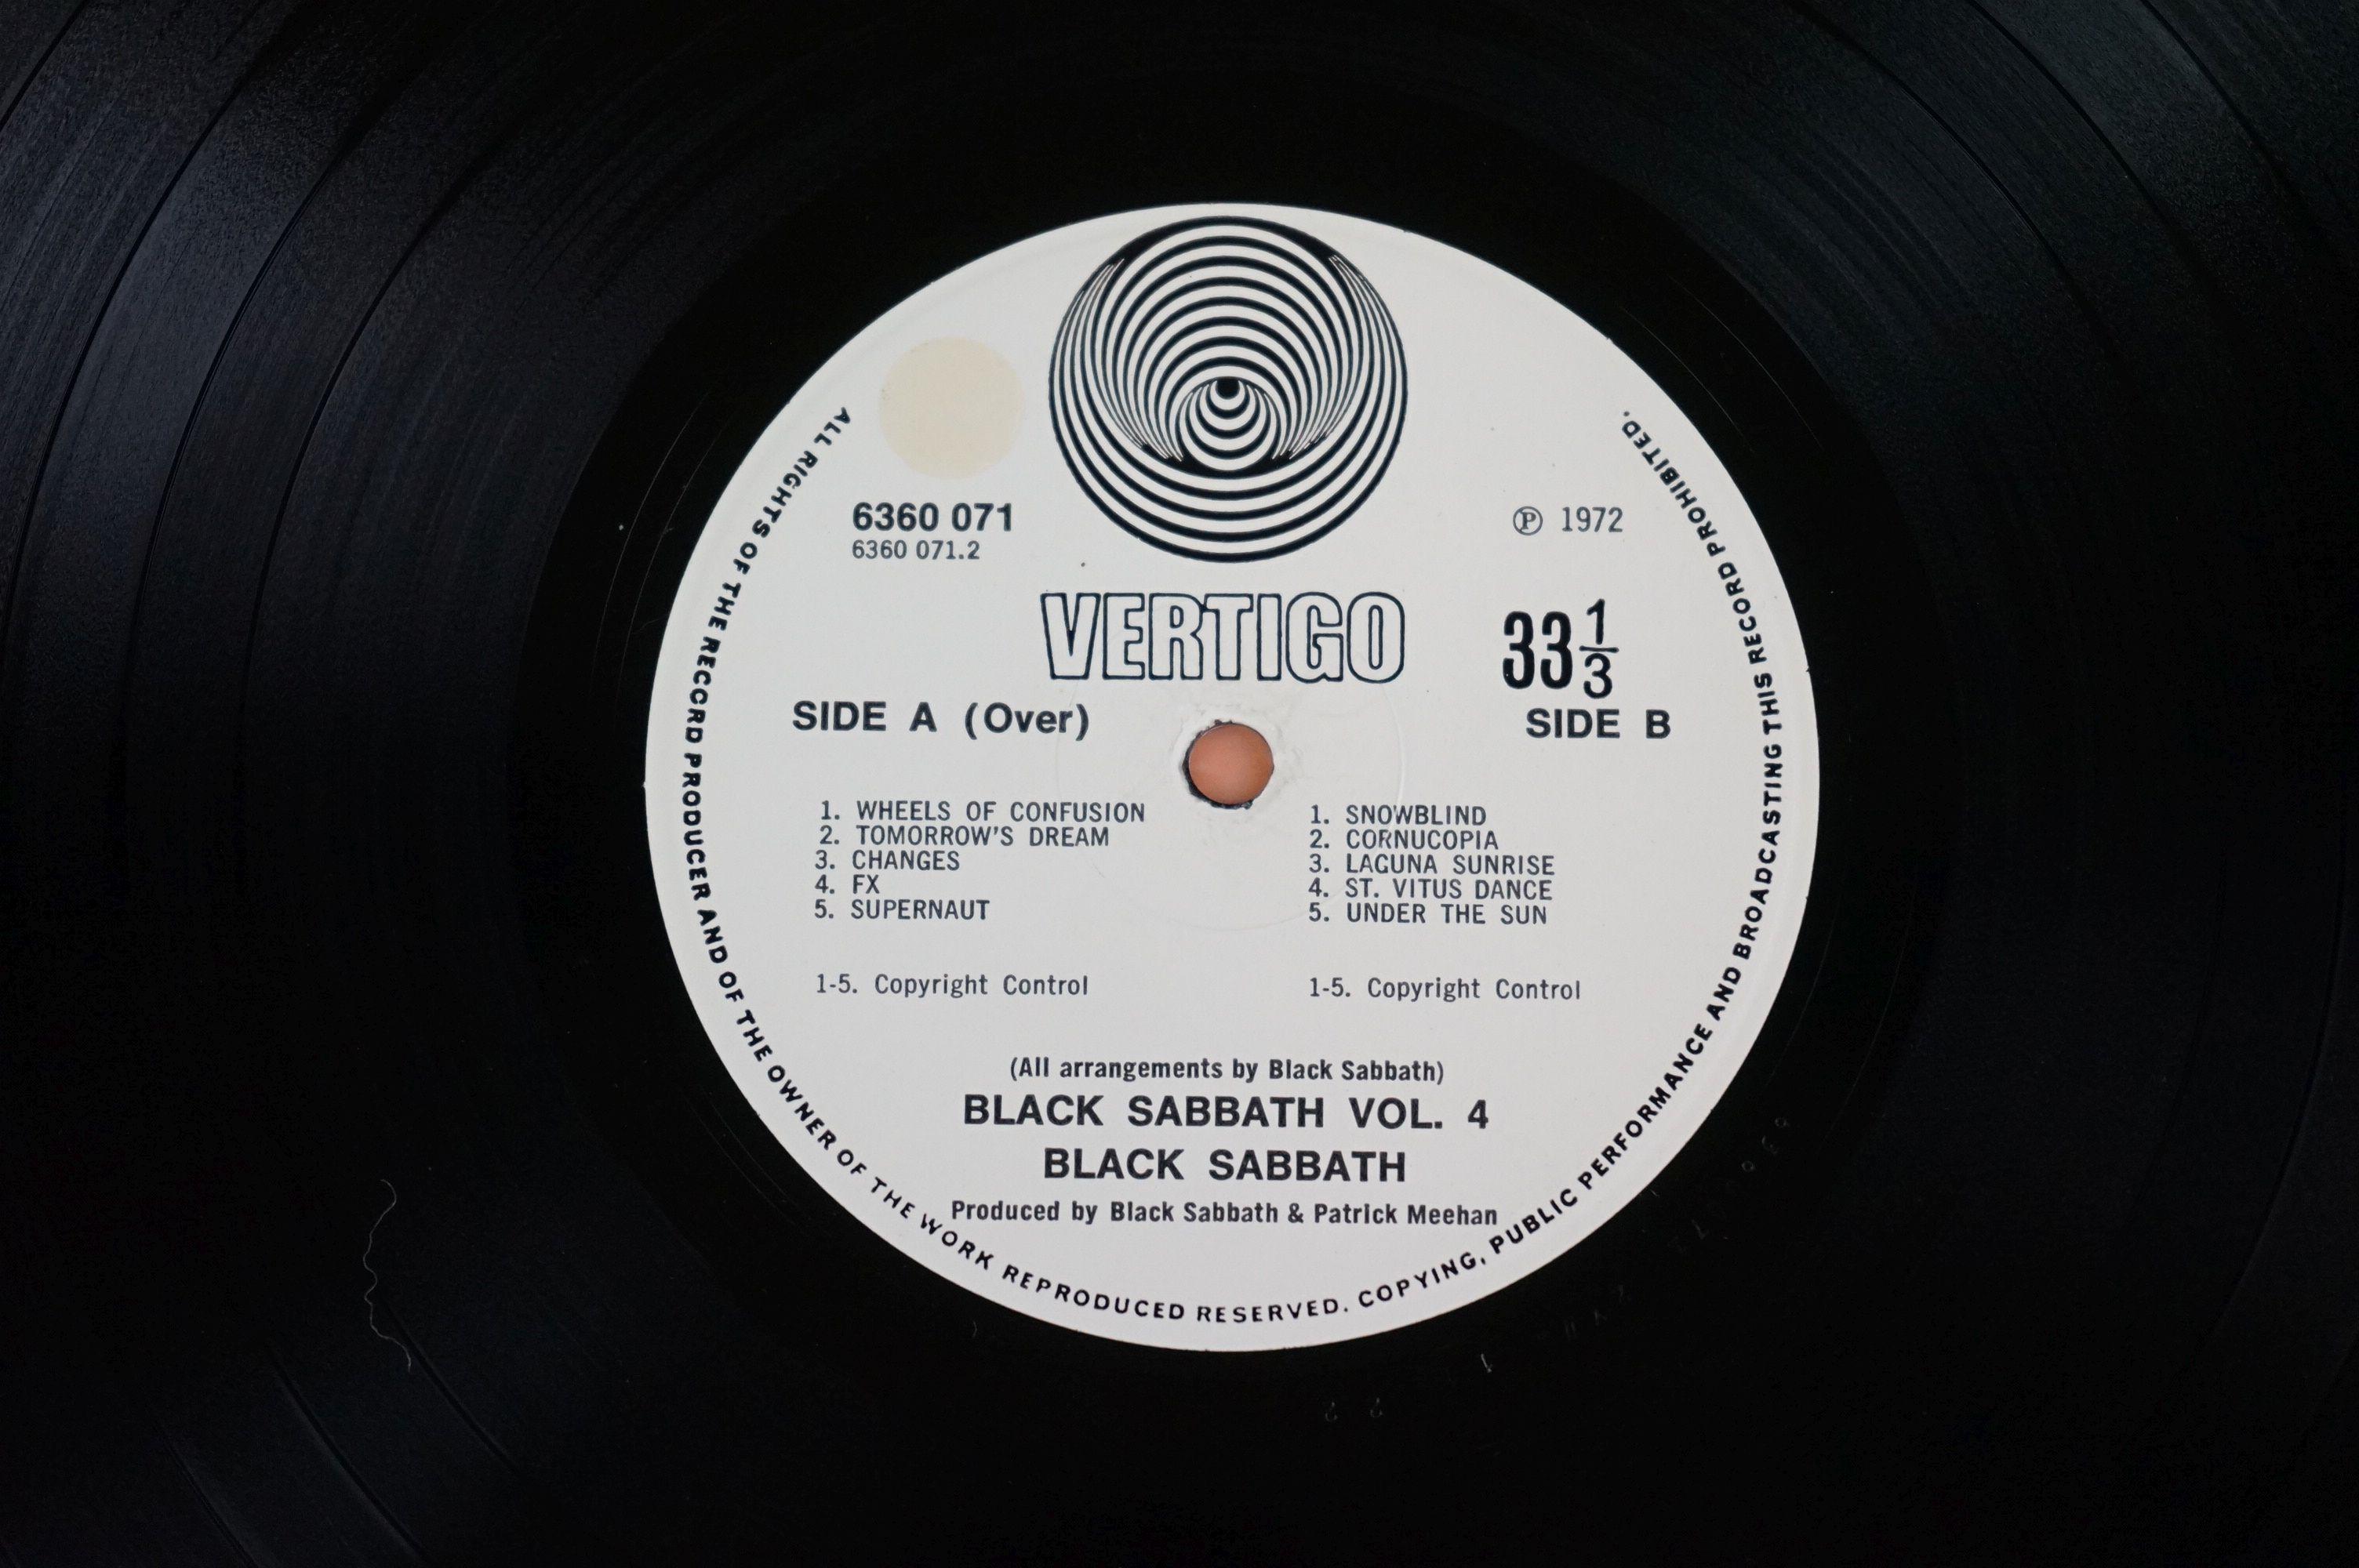 Vinyl - Black Sabbath vol 4 6360071 on Vertigo 1st pressing, no 'made in England' to label, gatefold - Image 6 of 6